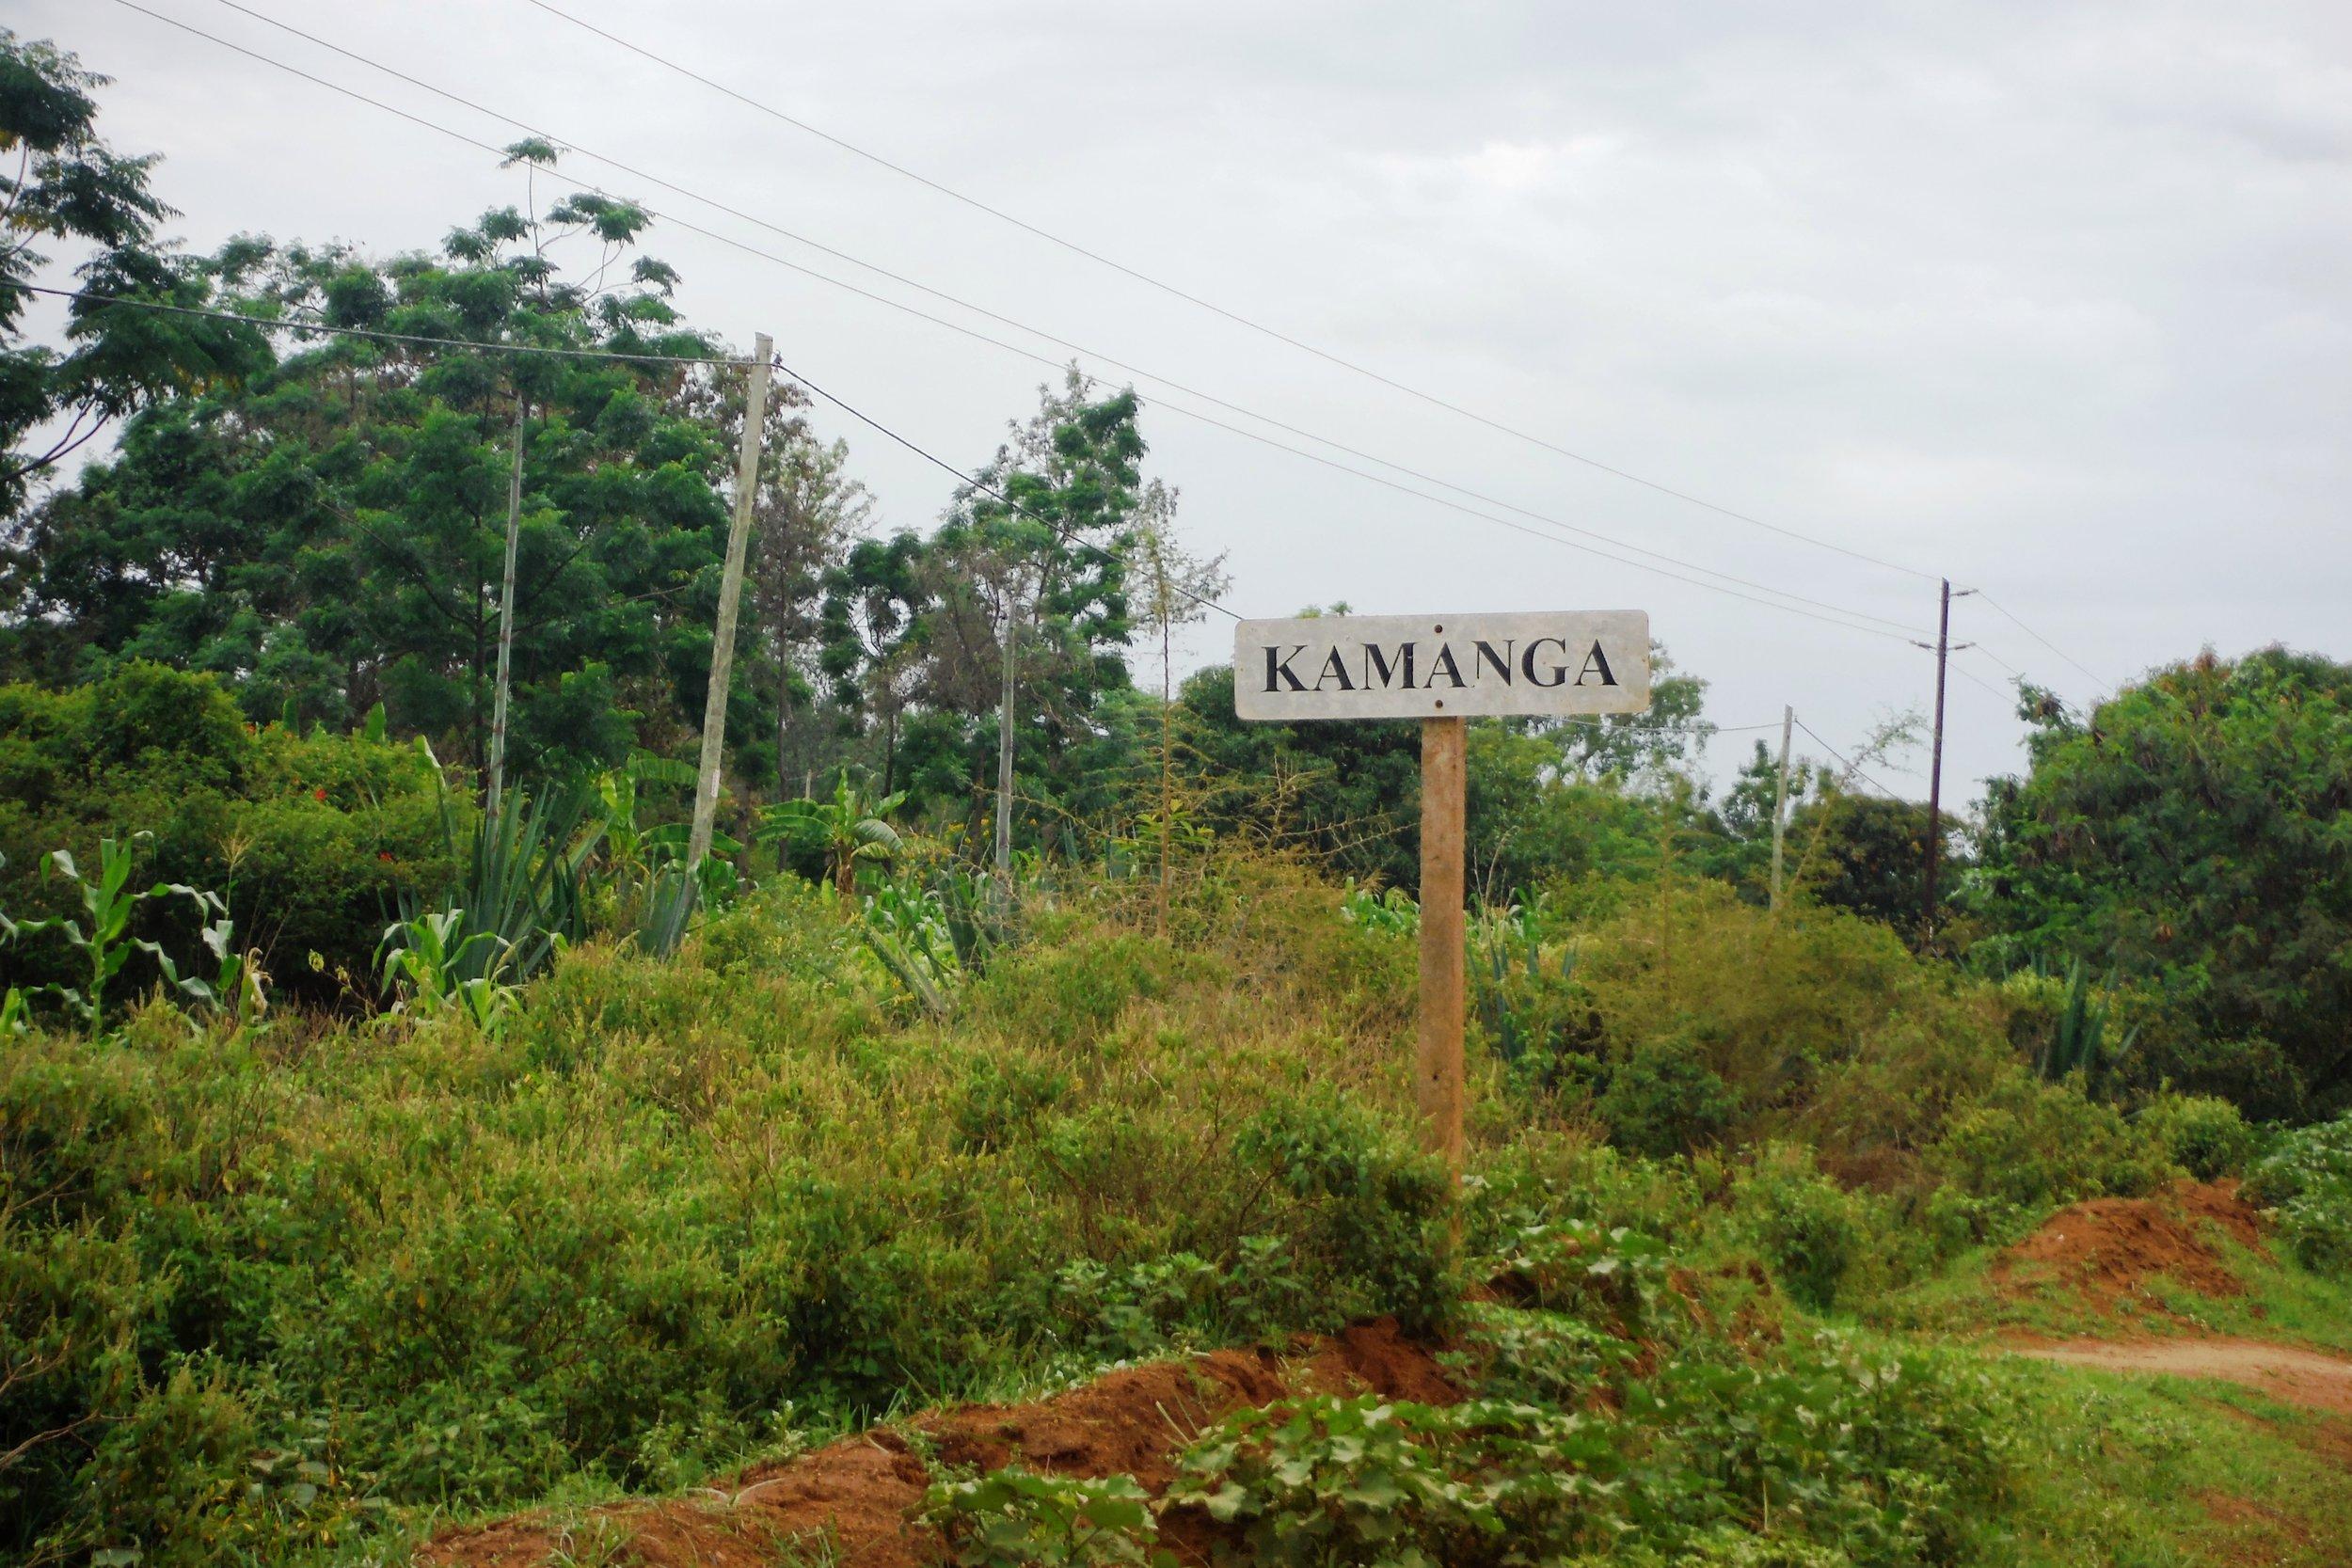 clour kamanga sign.jpg